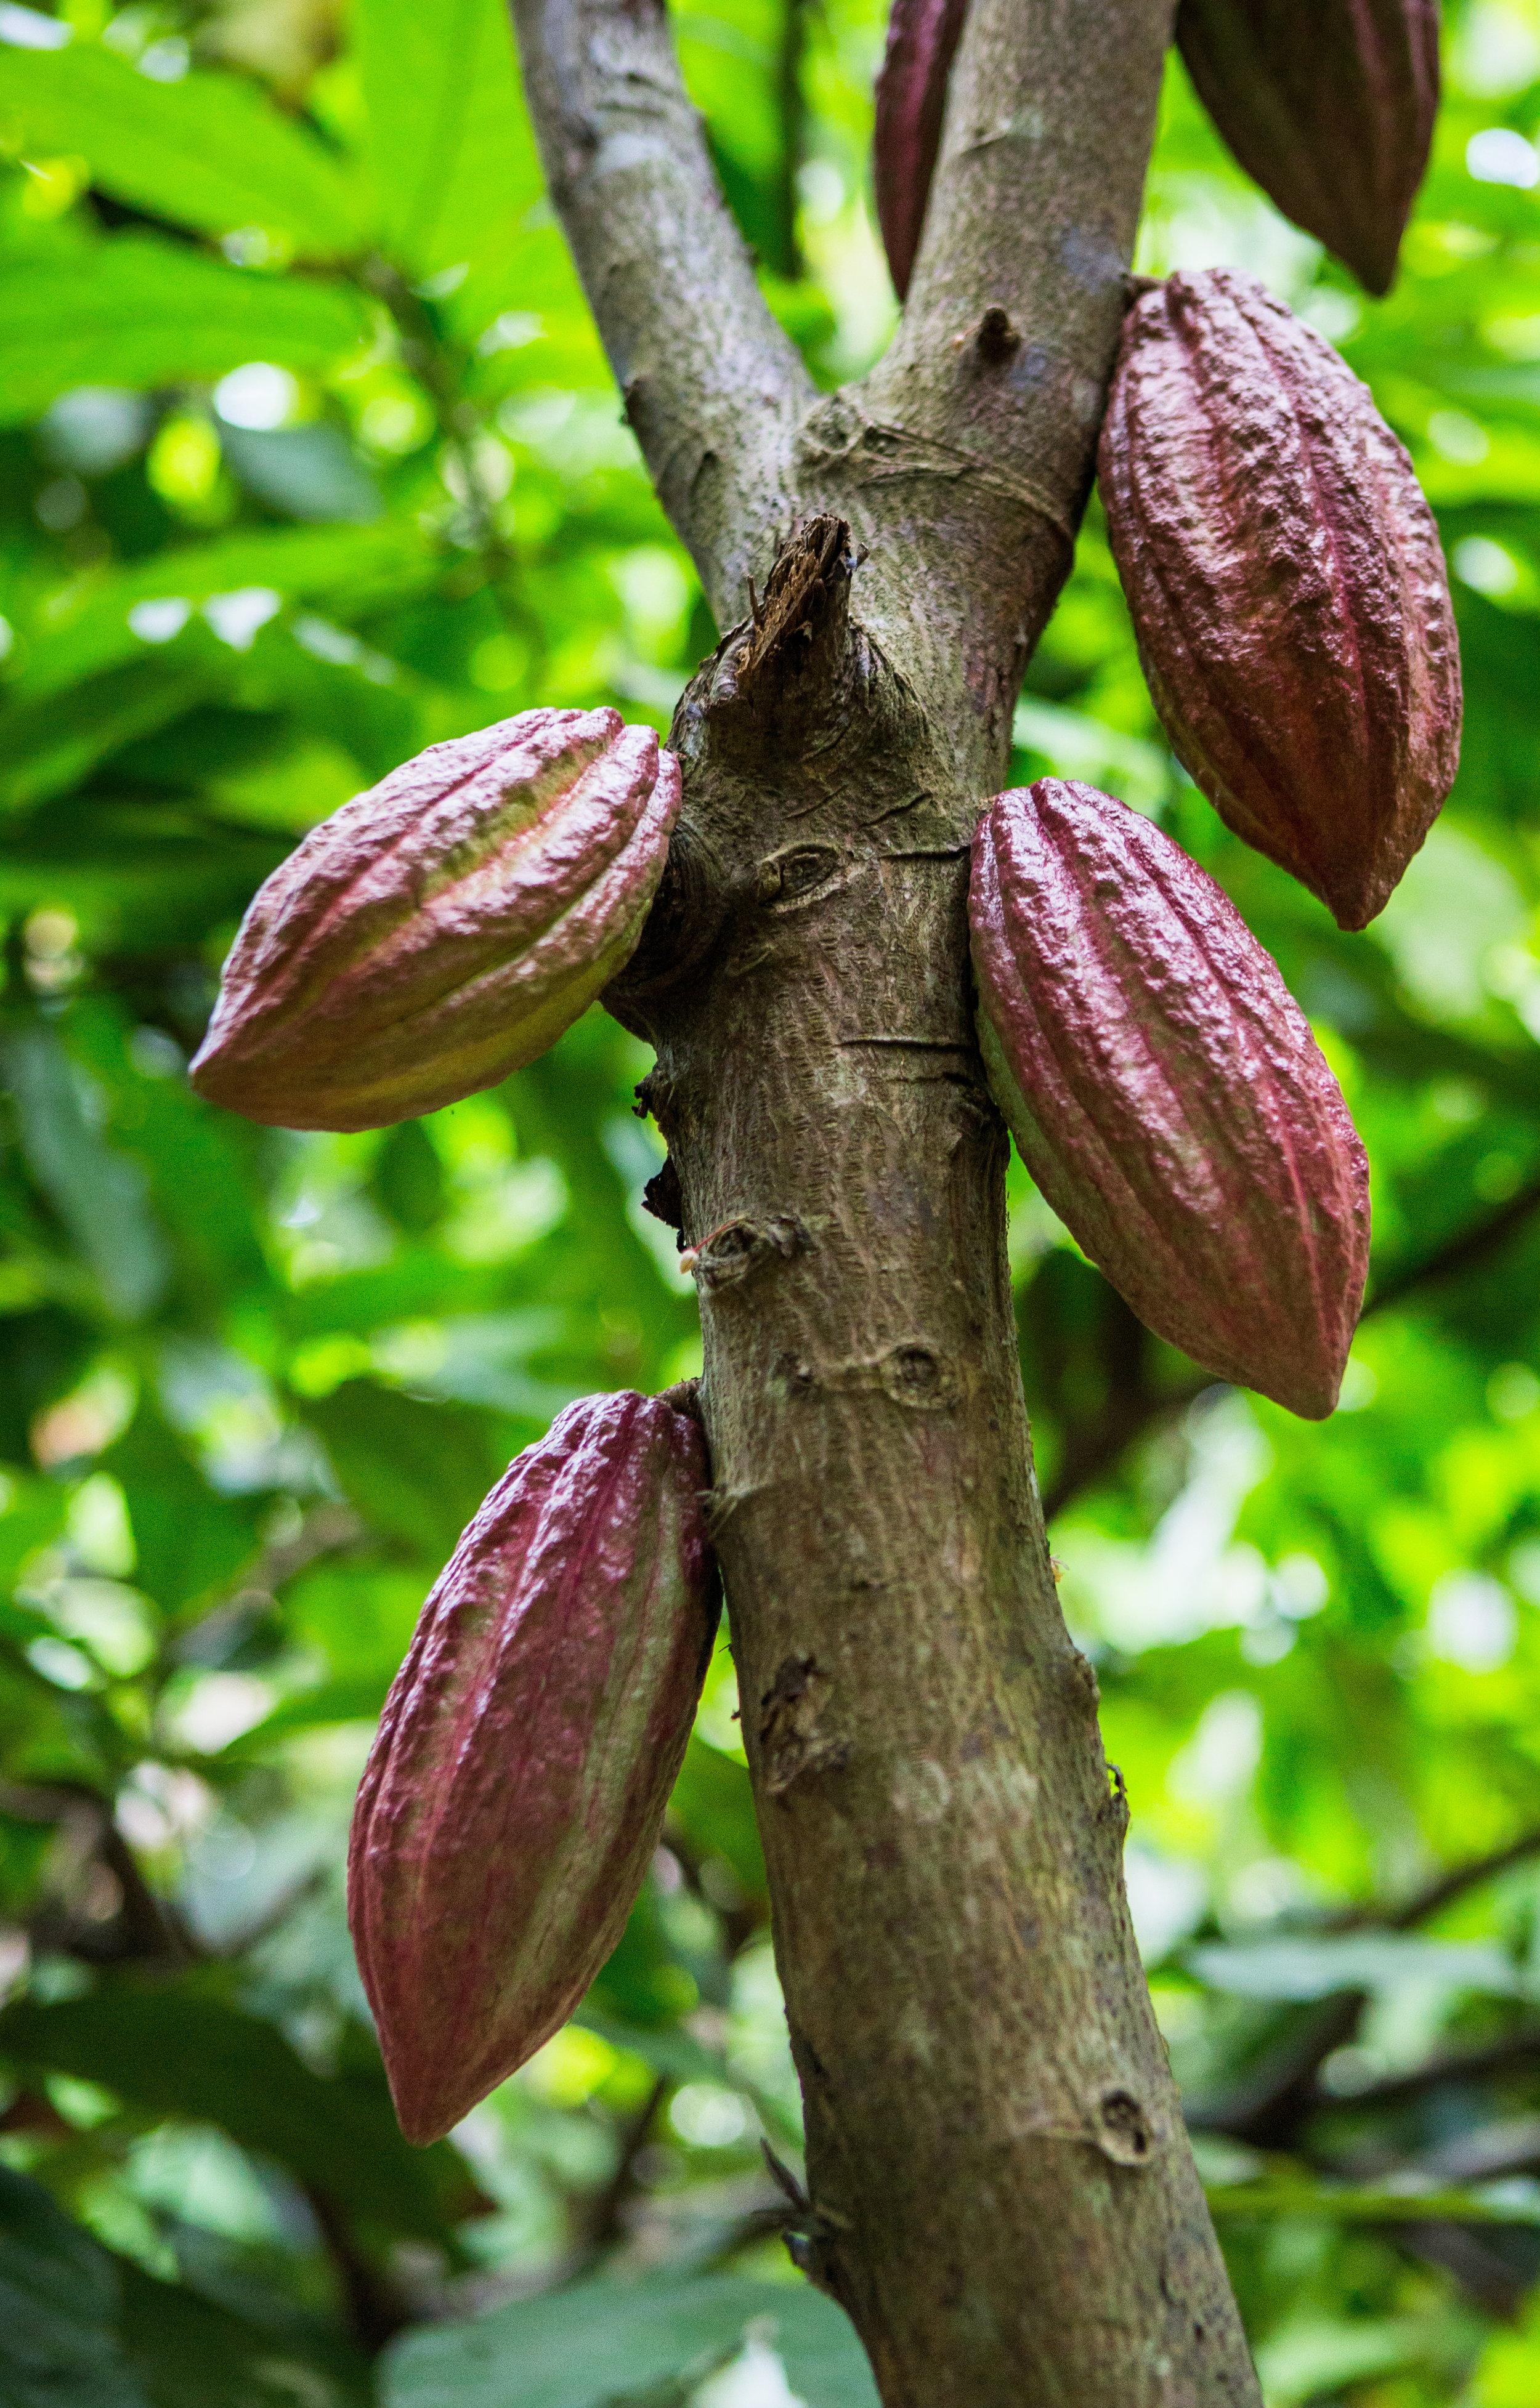 Cocoa Pods on the Vine